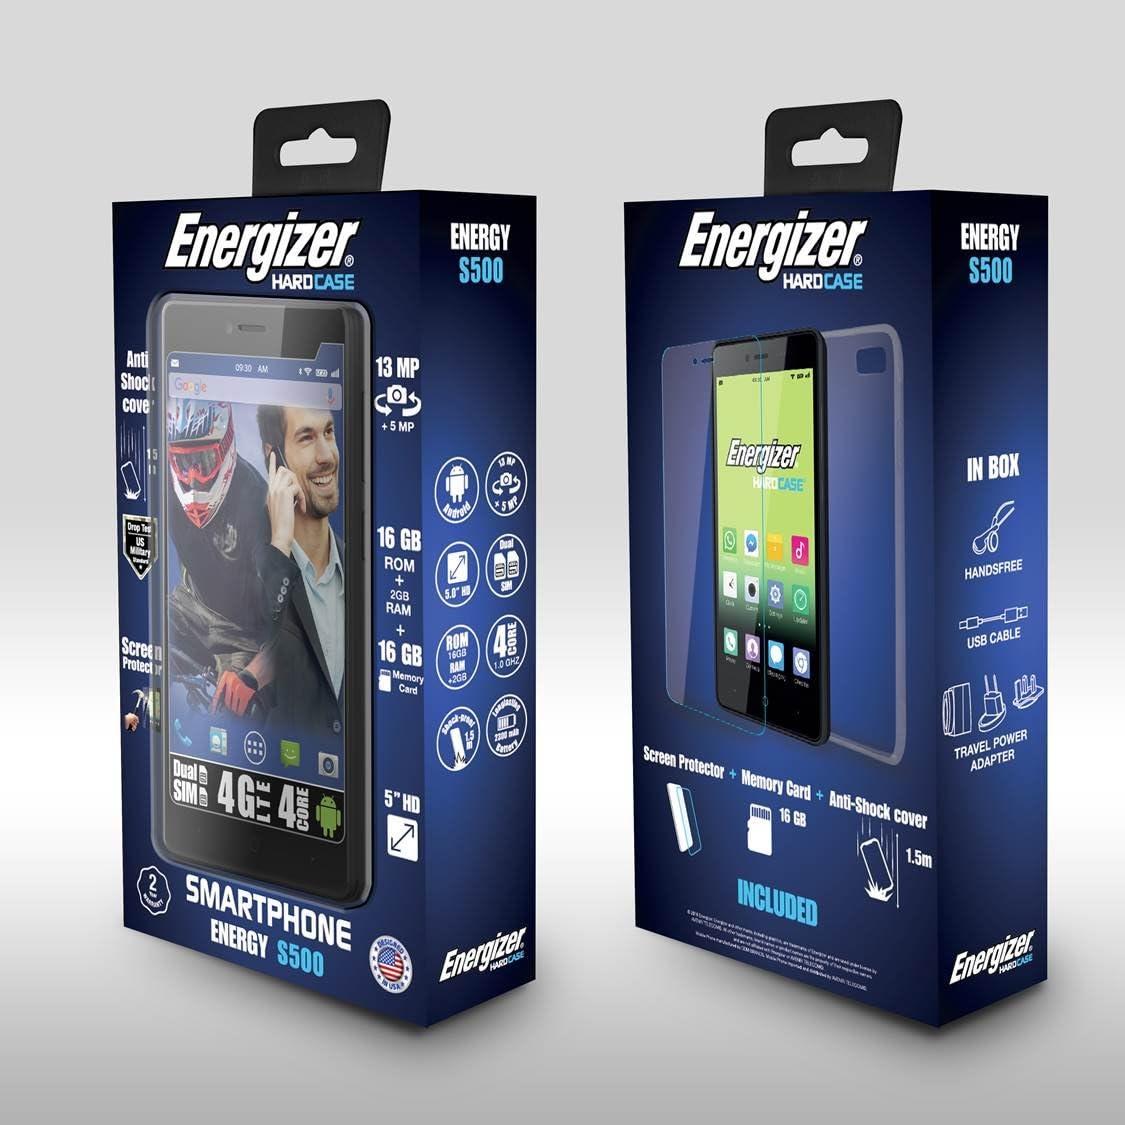 Energizer   Smartphone Energy 400 Dual SIM 3G A-GPS Resistente ...